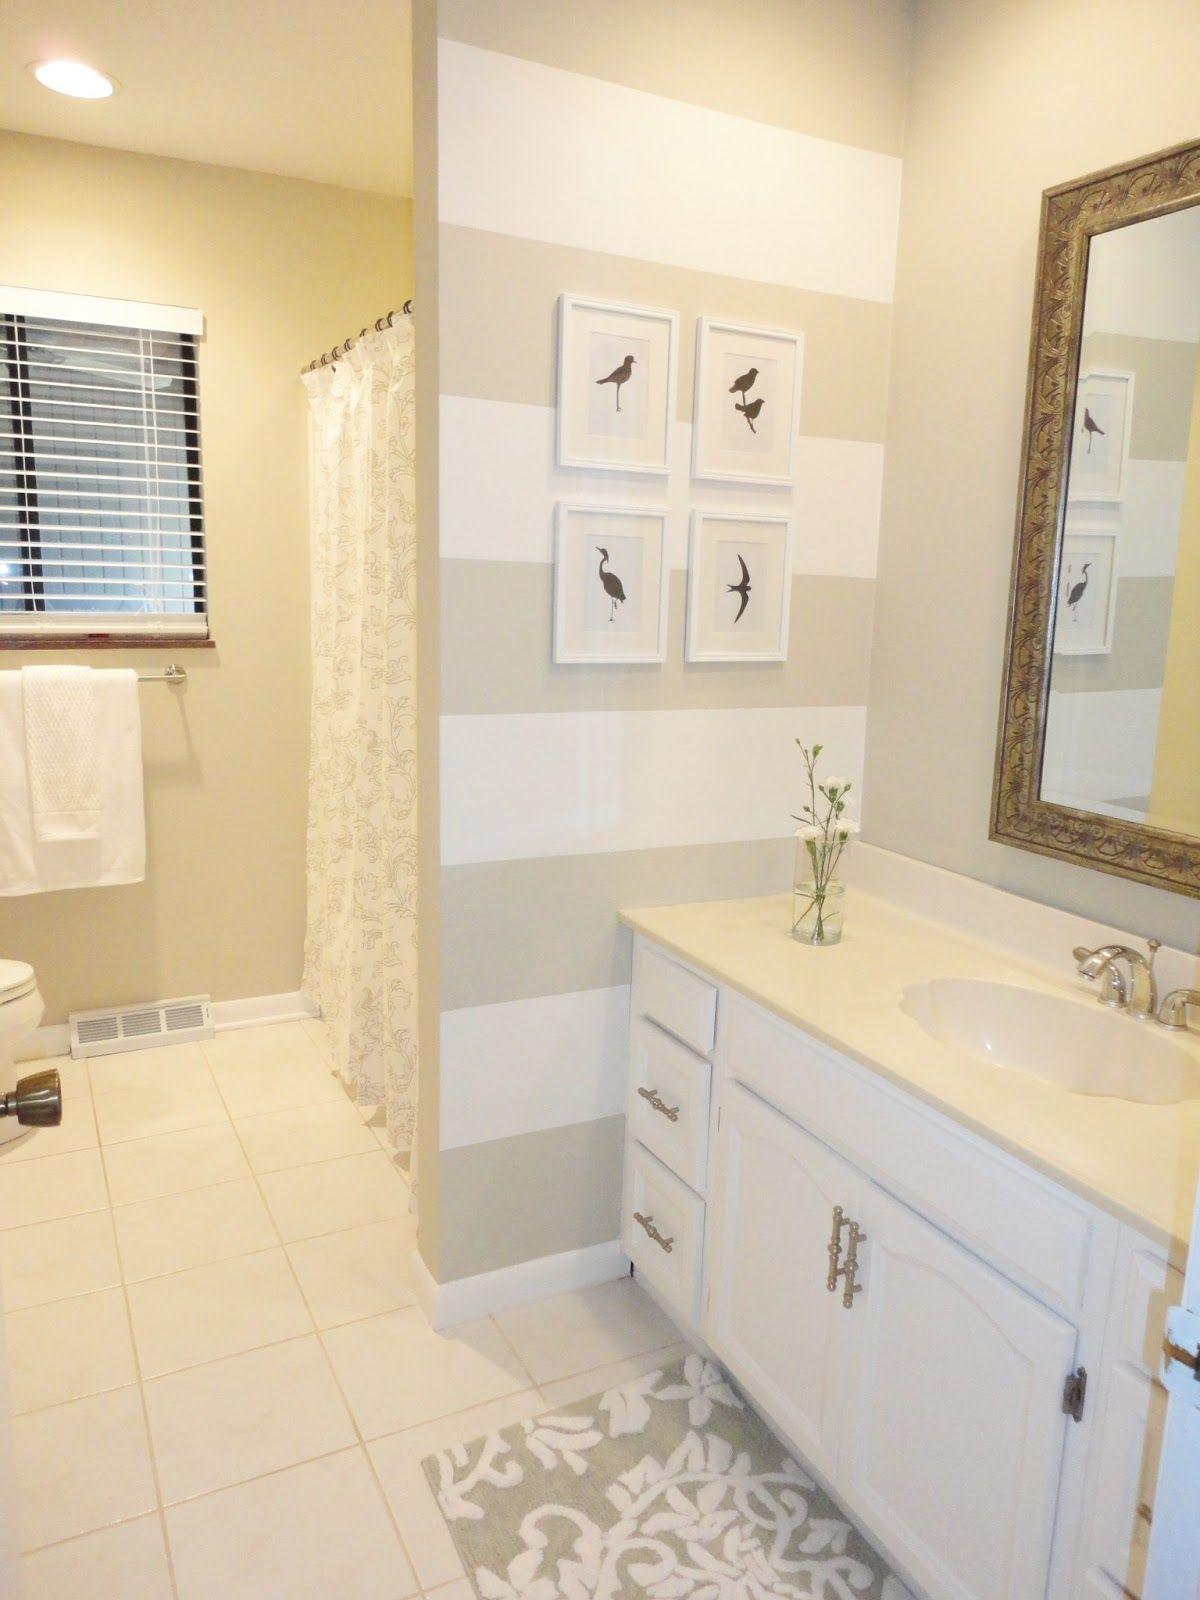 Latest In Bathroom Design Enchanting Latest Posts Under Bathroom Design Ideas  Bathroom Design 2017 Design Inspiration